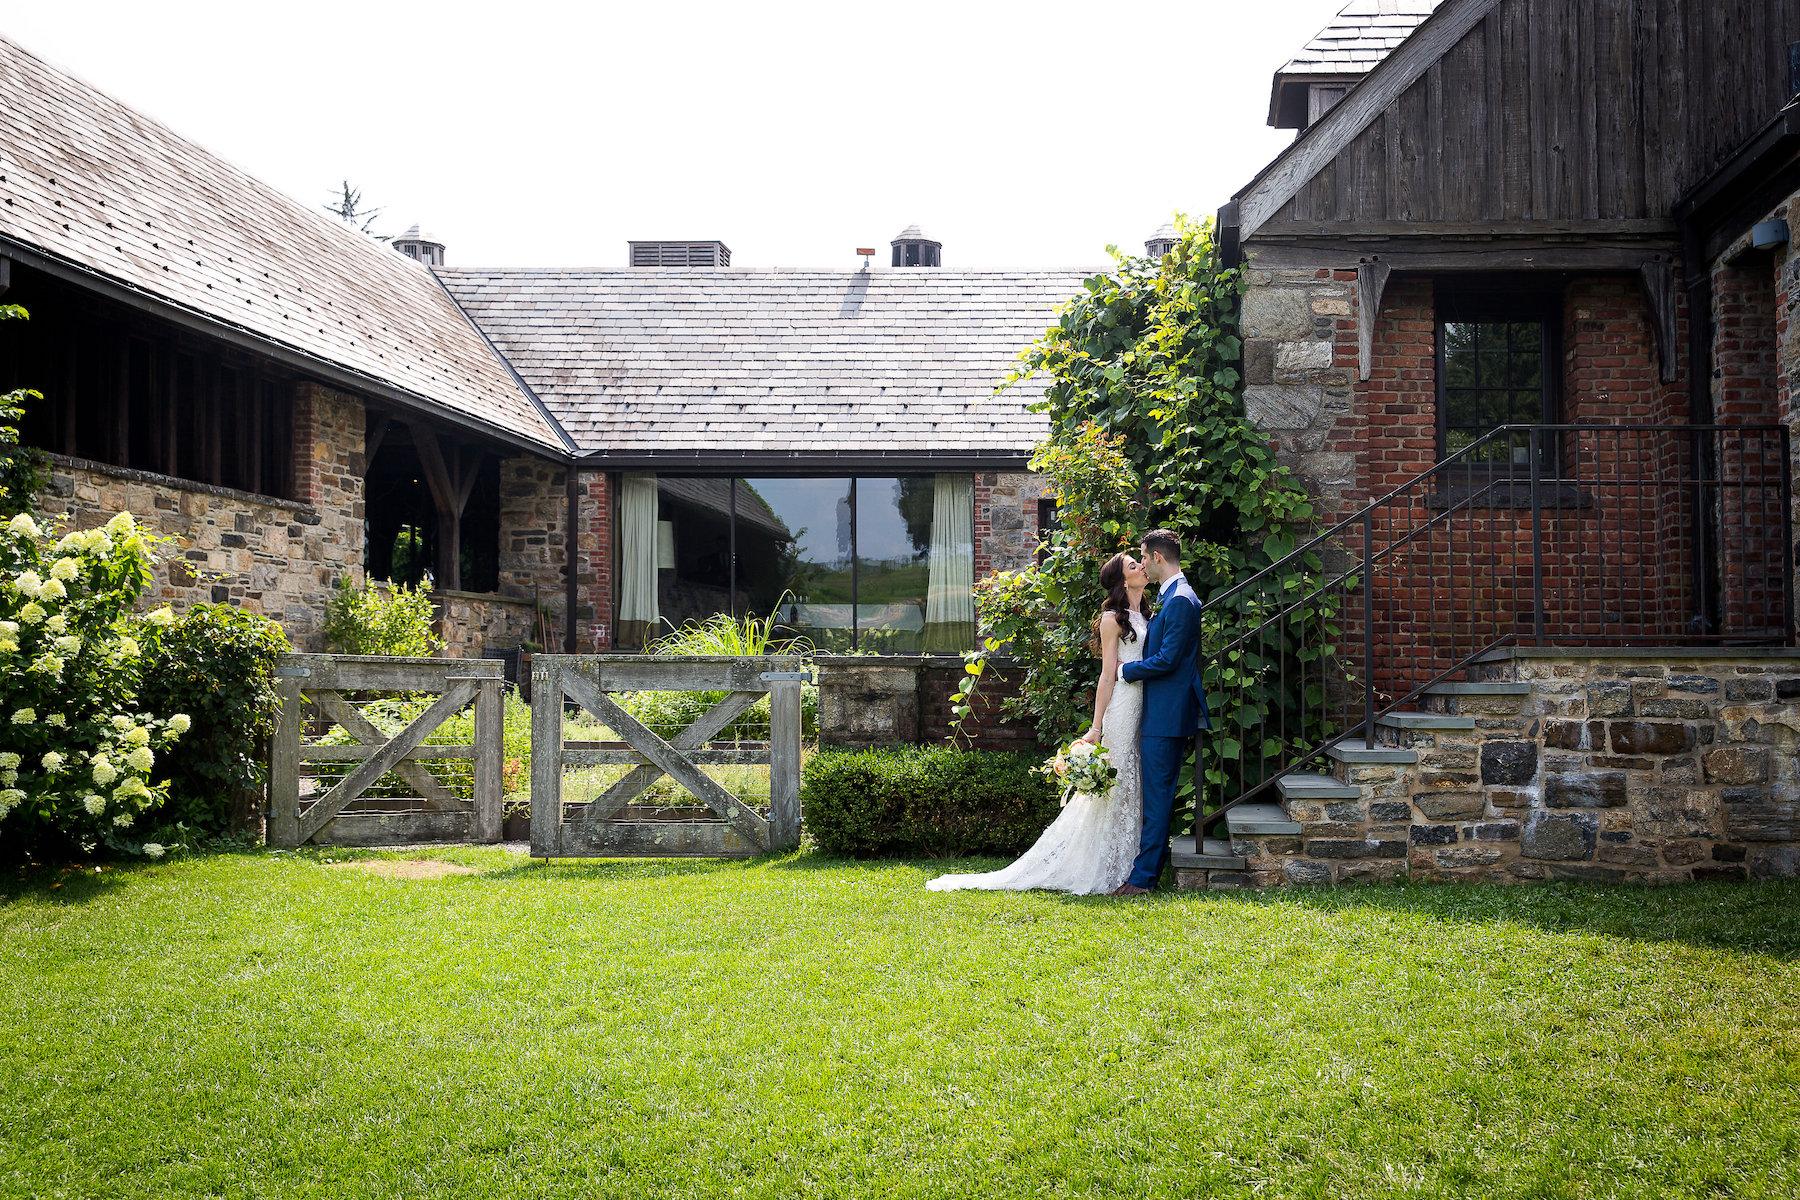 Summer Farm to Table Wedding - Denise Fasanello Flowers 21.jpg